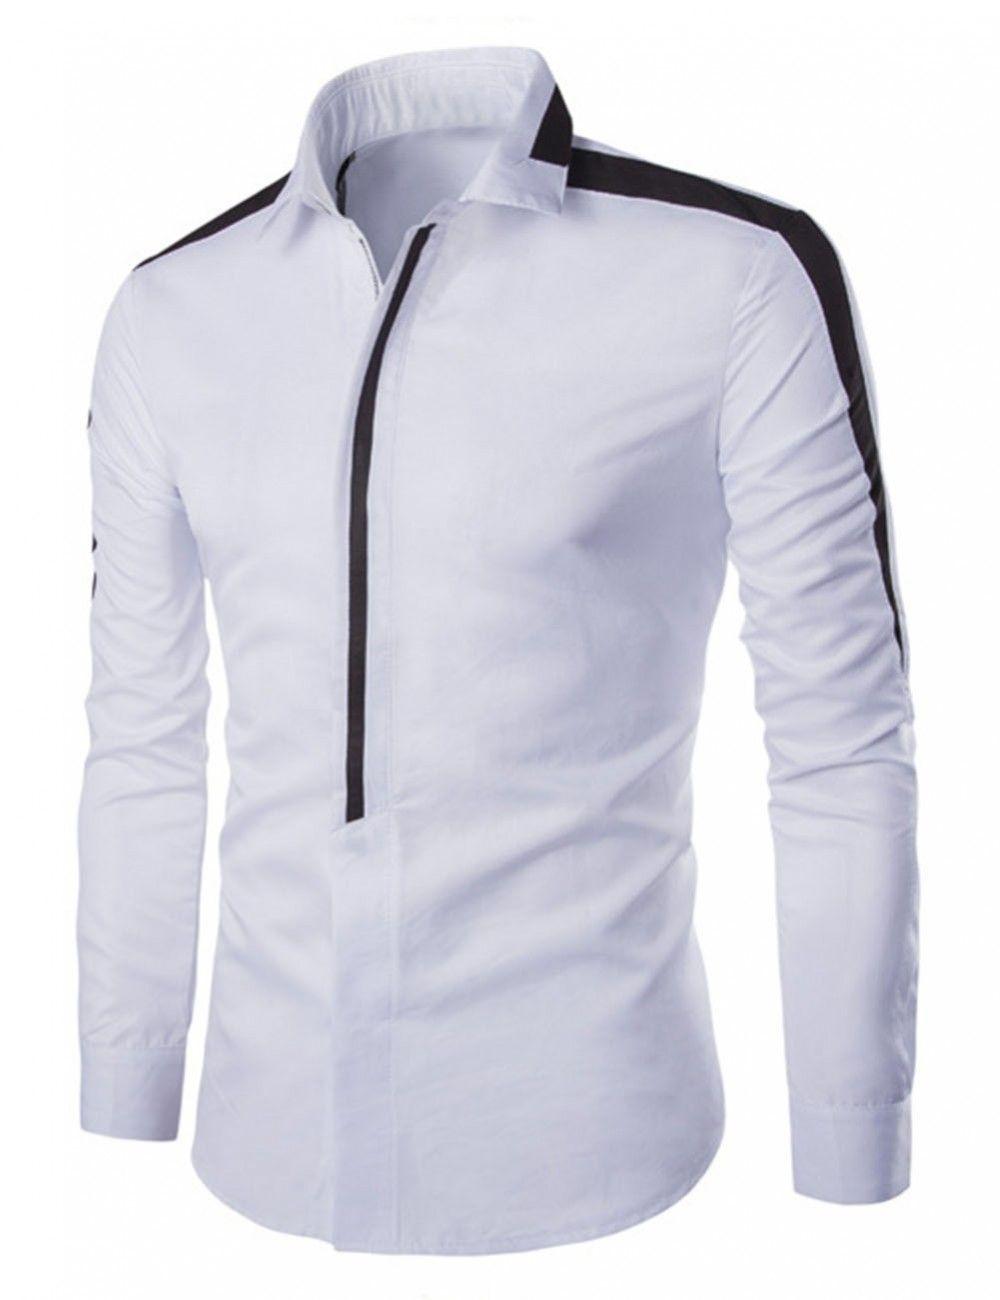 Mens Korean Color Stitching Fashion Long Sleeve Slim Cotton Leisure T Shirt Tops